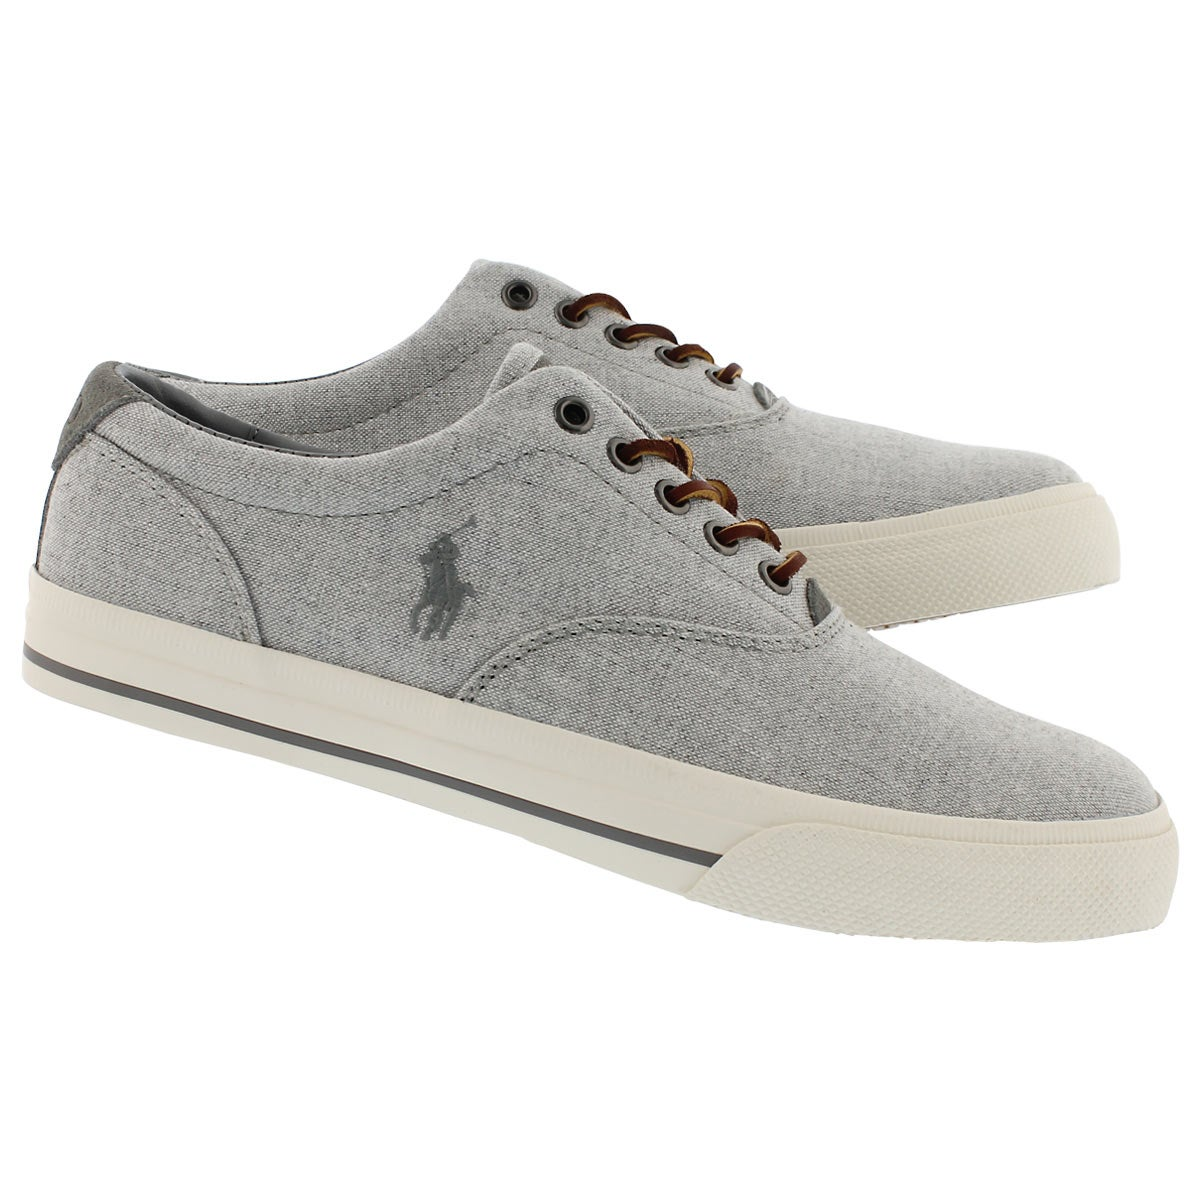 Mns Vaughn grey yarn dyed cnvs sneaker